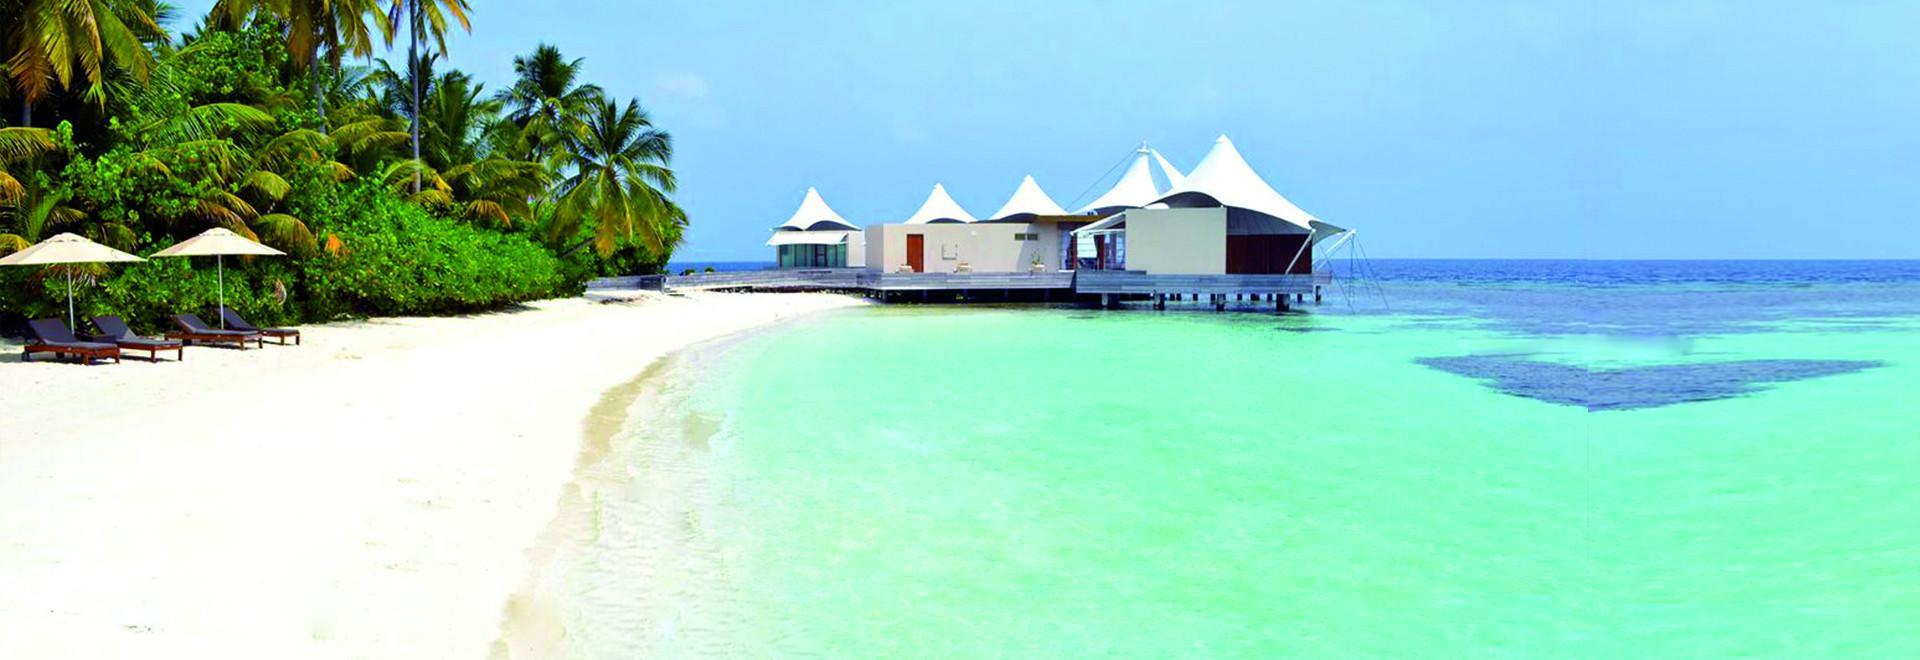 Milionari su un'isola